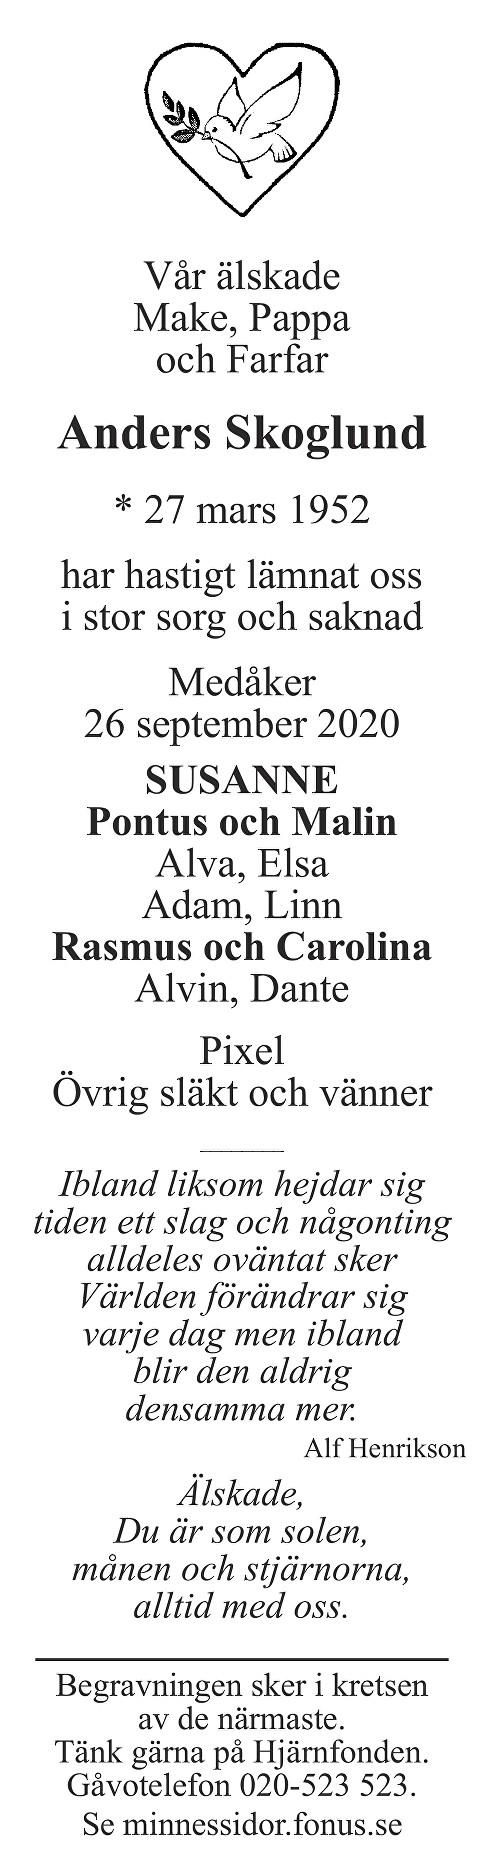 Anders Skoglund Death notice